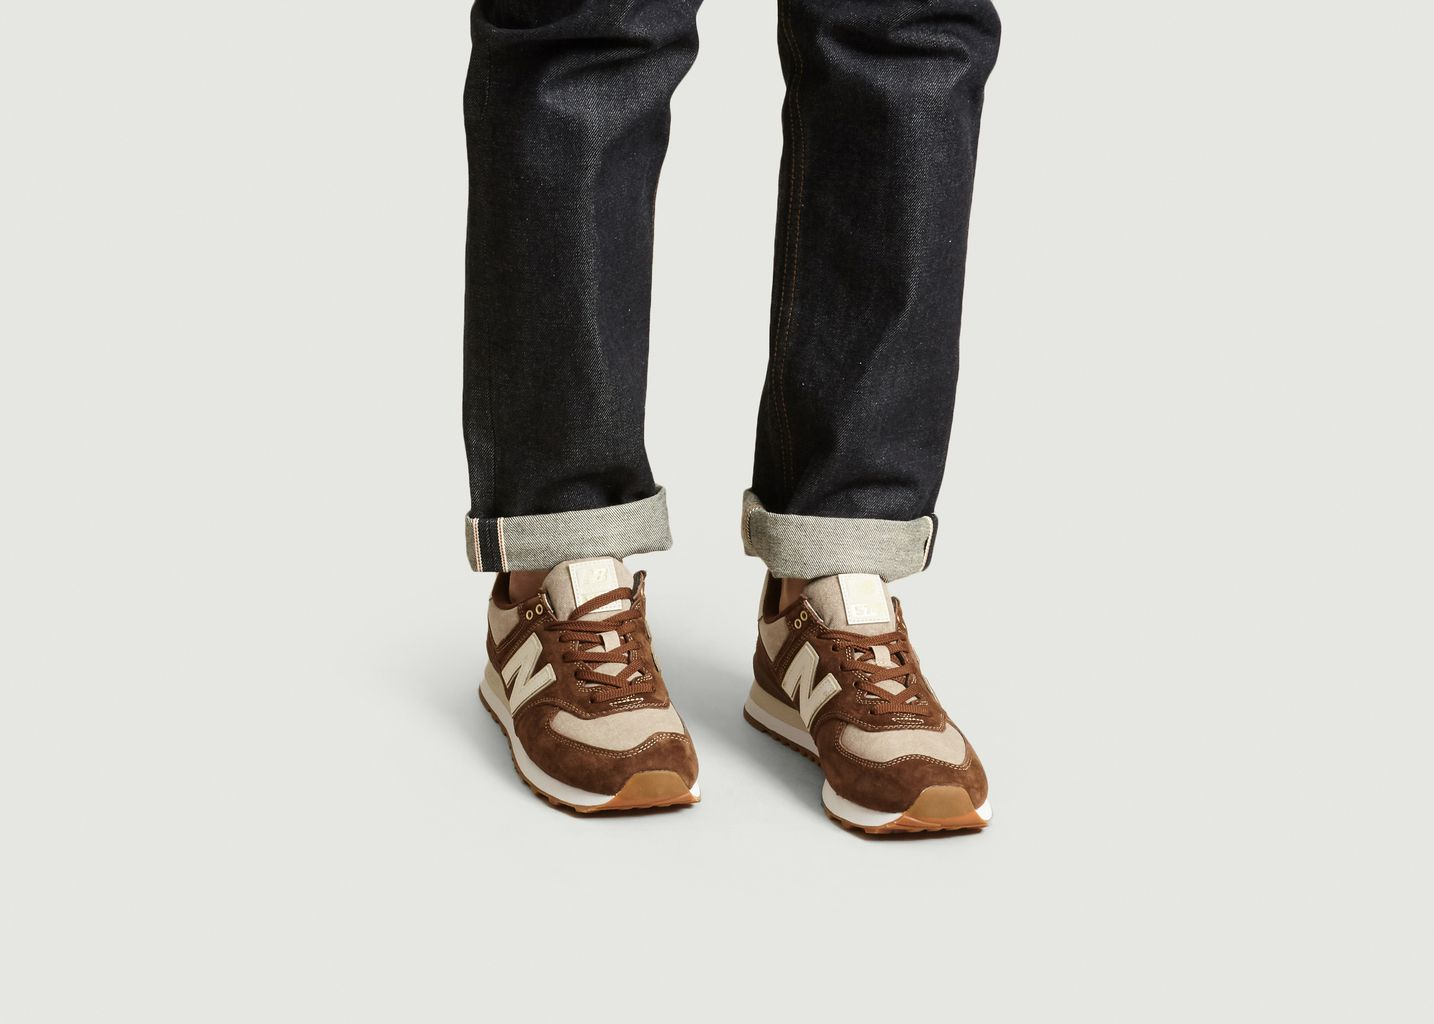 Sneakers Daim Et Tissu ML574 - New Balance